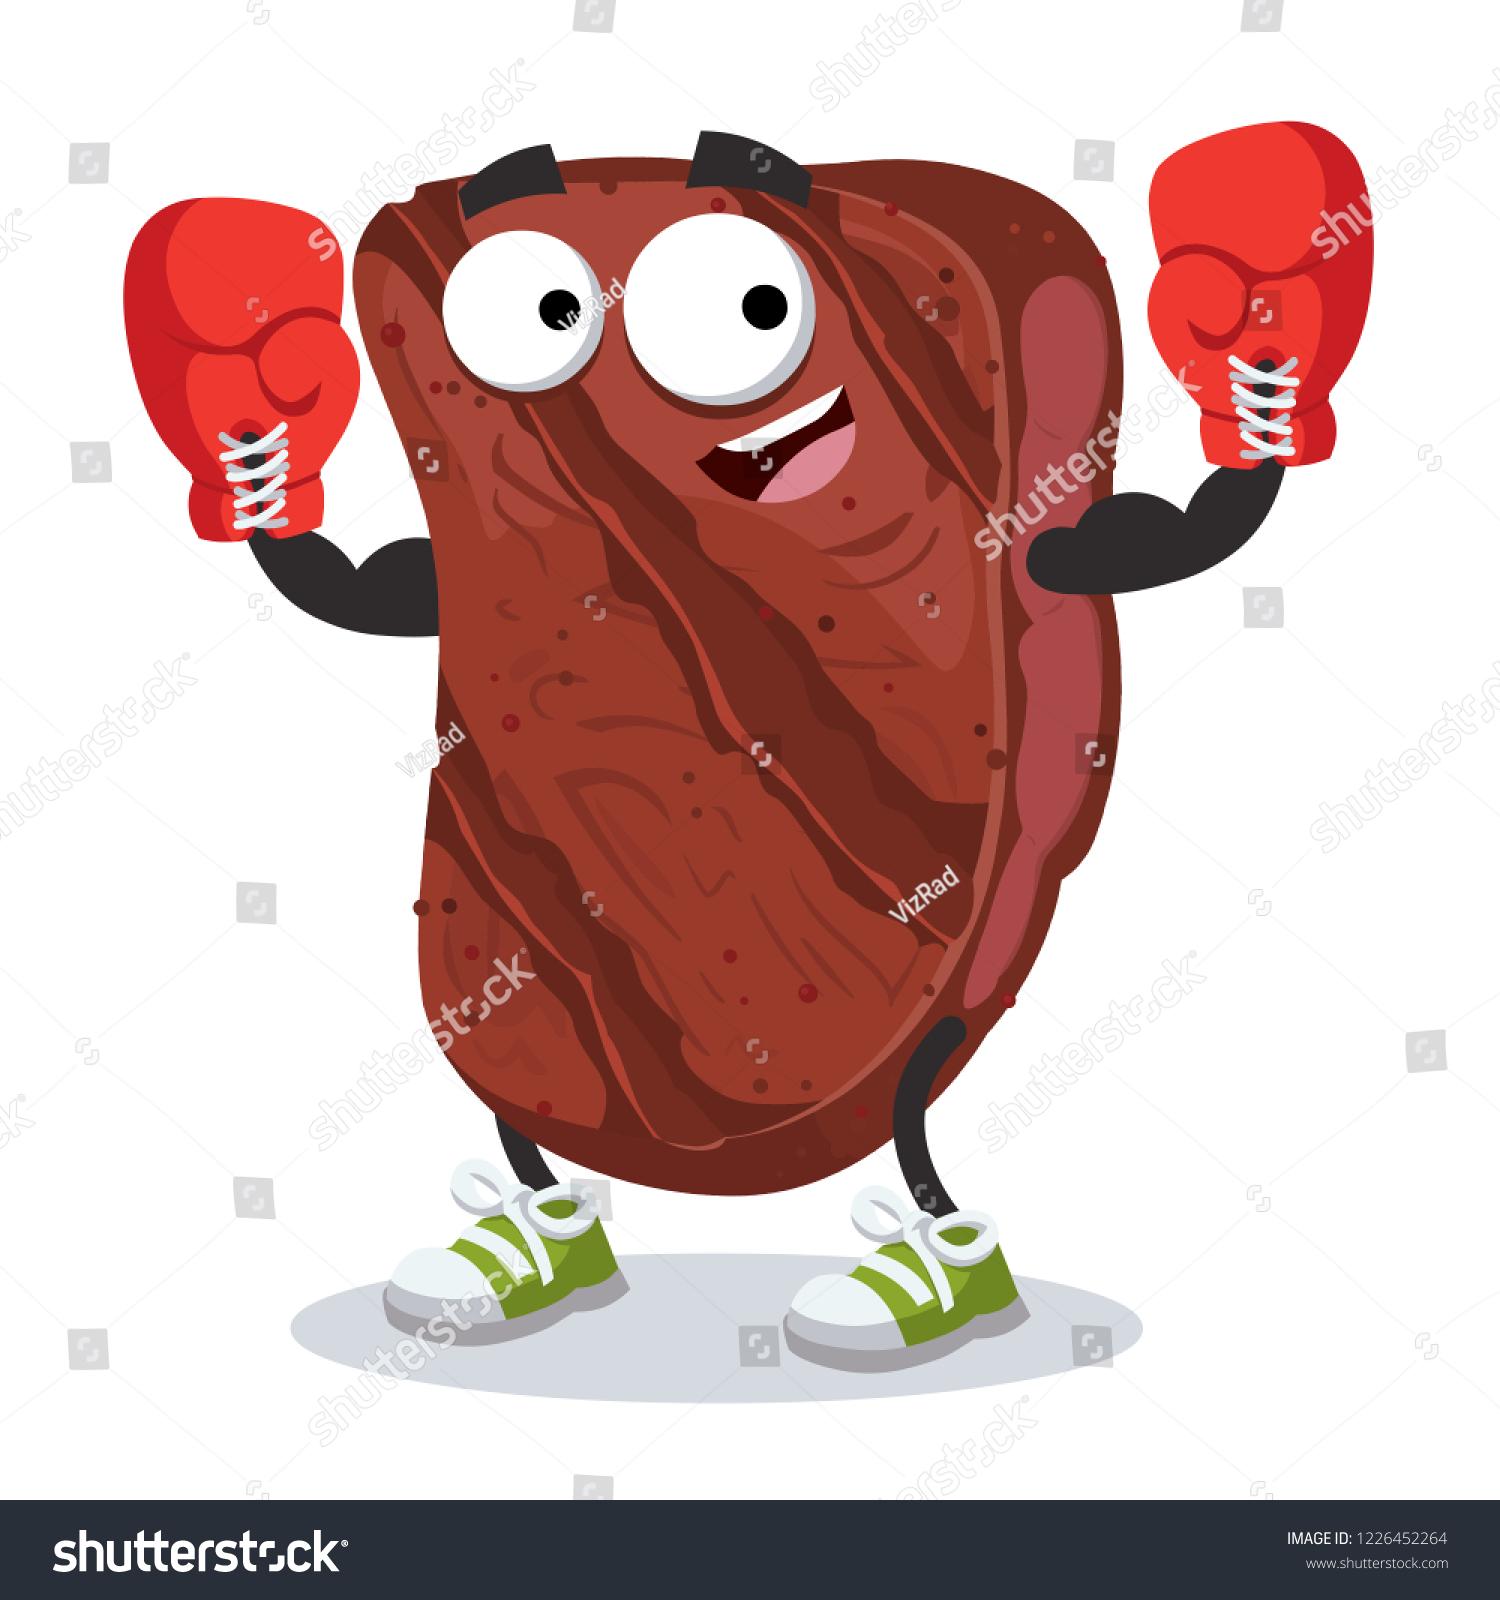 cartoon grilled marbled beef steak mascot stock vector royalty free 1226452264 https www shutterstock com image vector cartoon grilled marbled beef steak mascot 1226452264